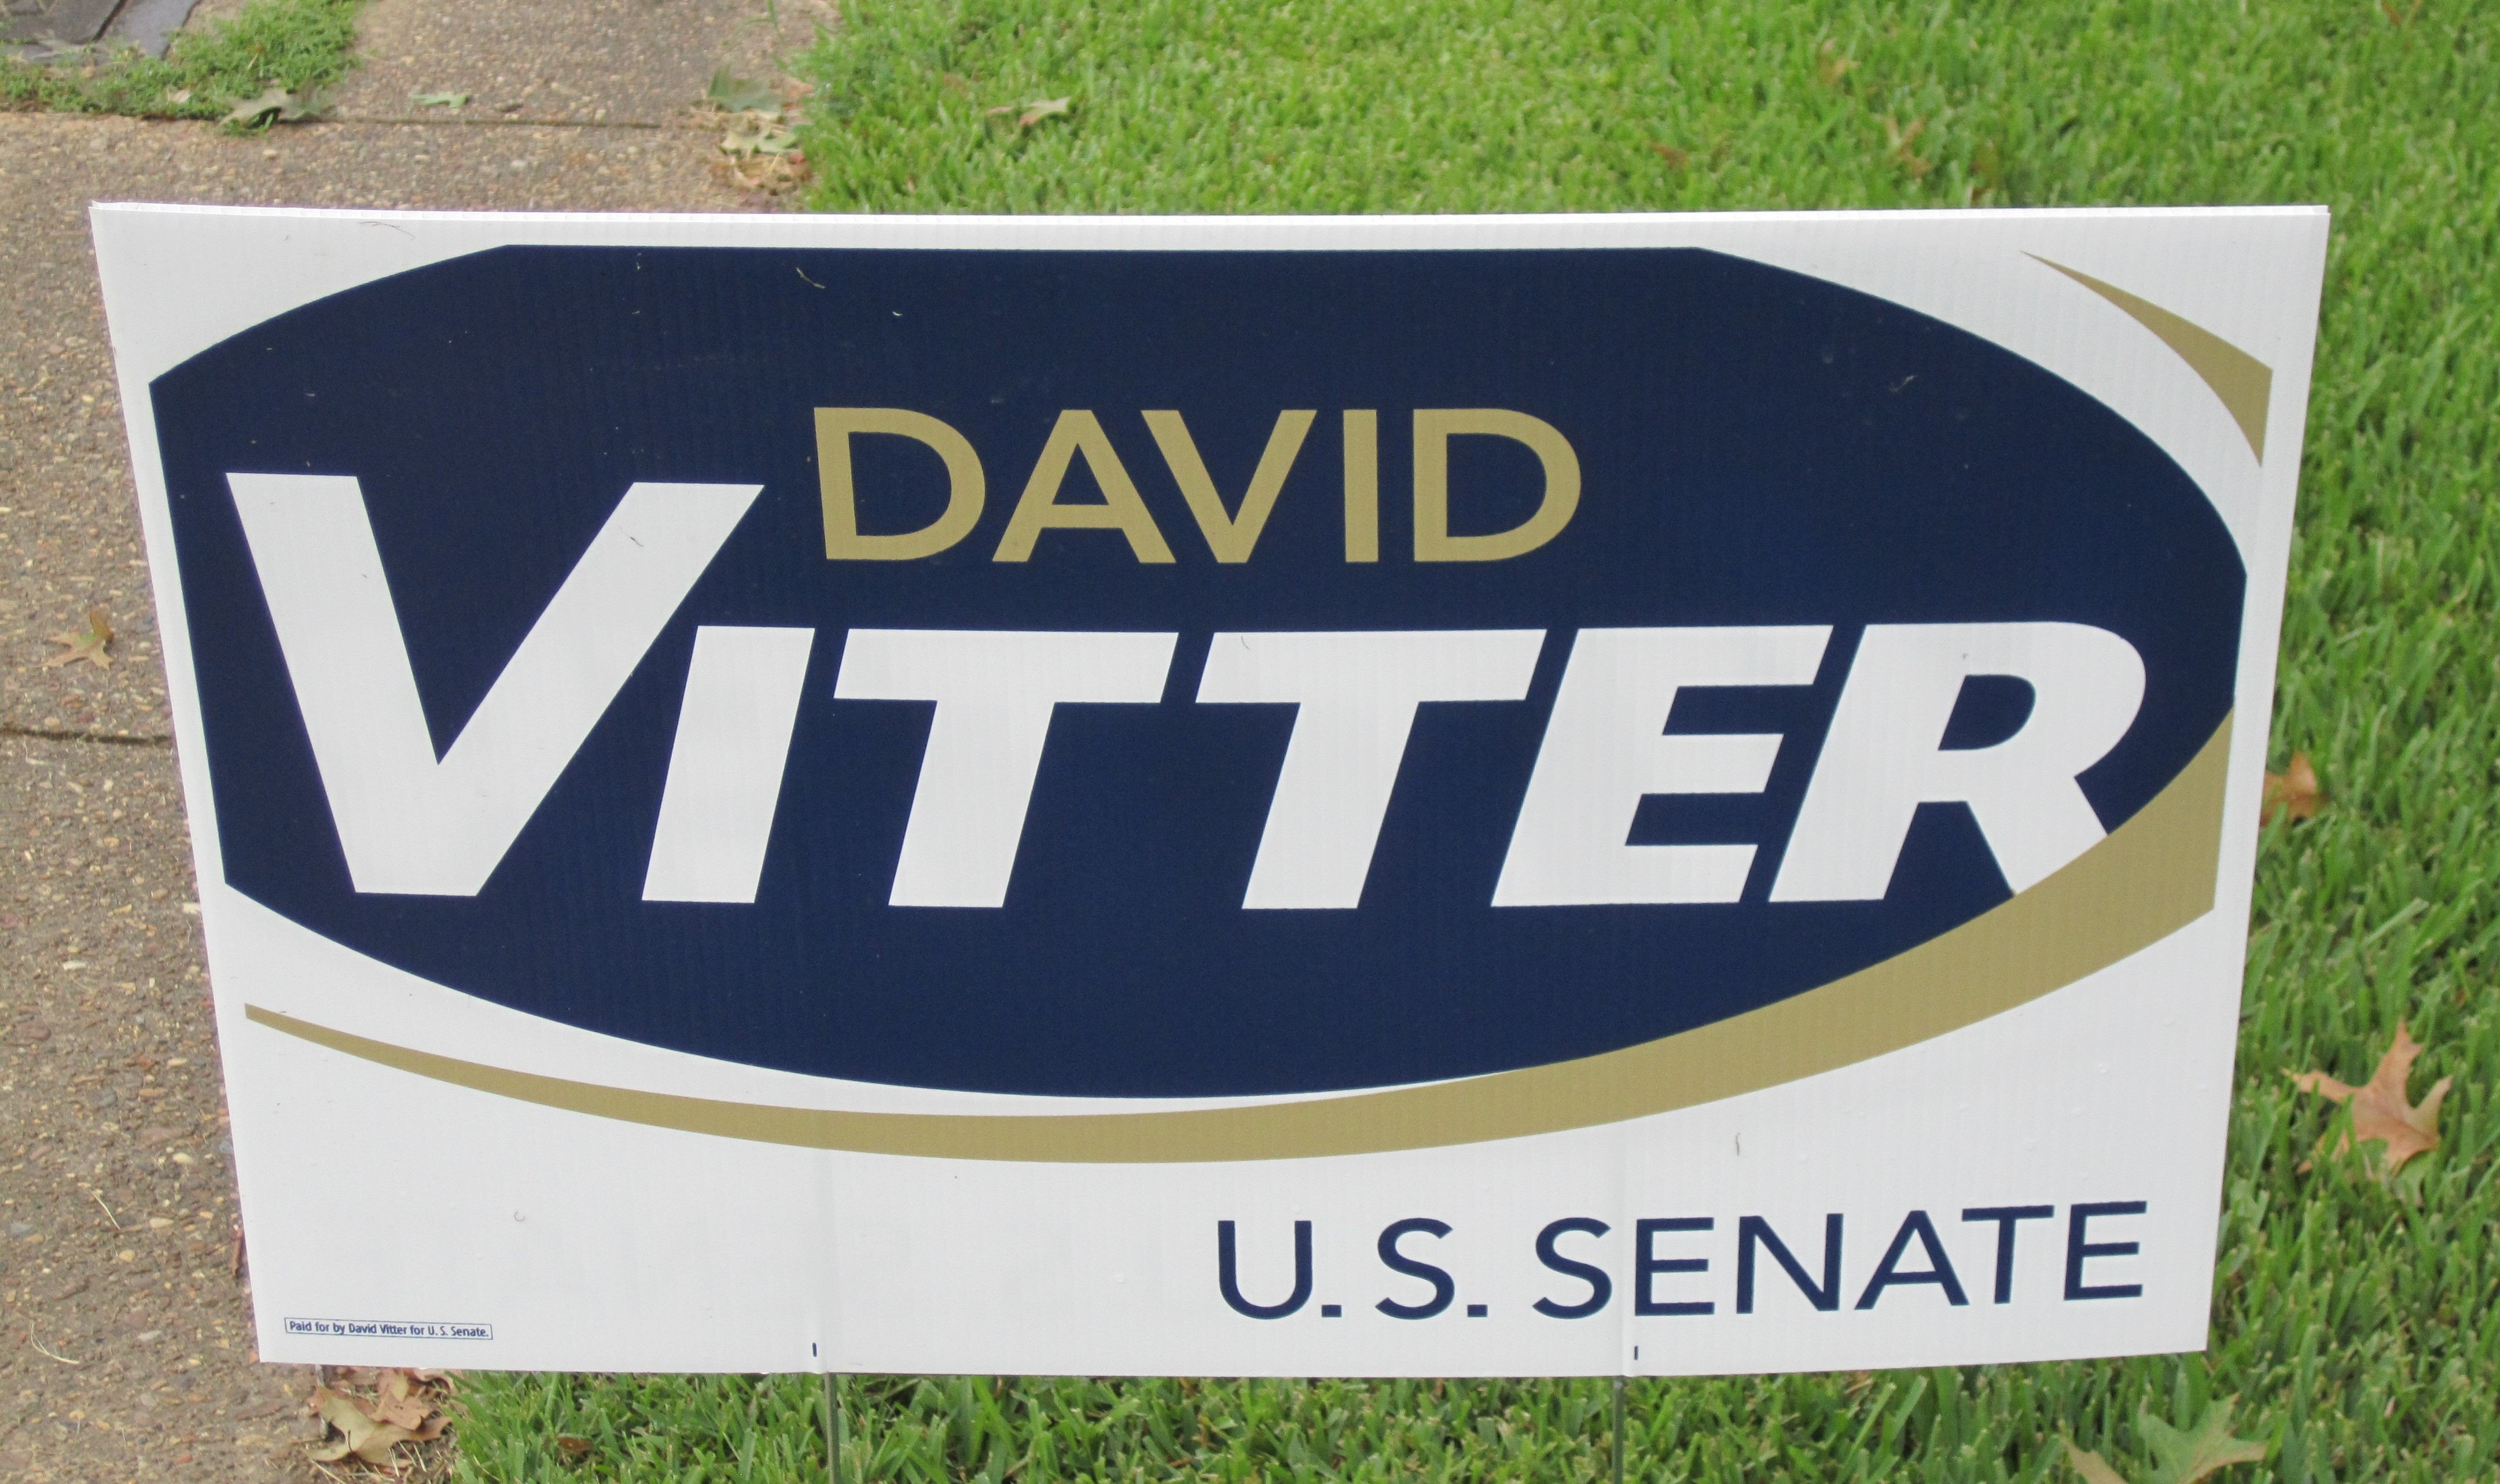 David_Vitter_yard_sign_IMG_0018